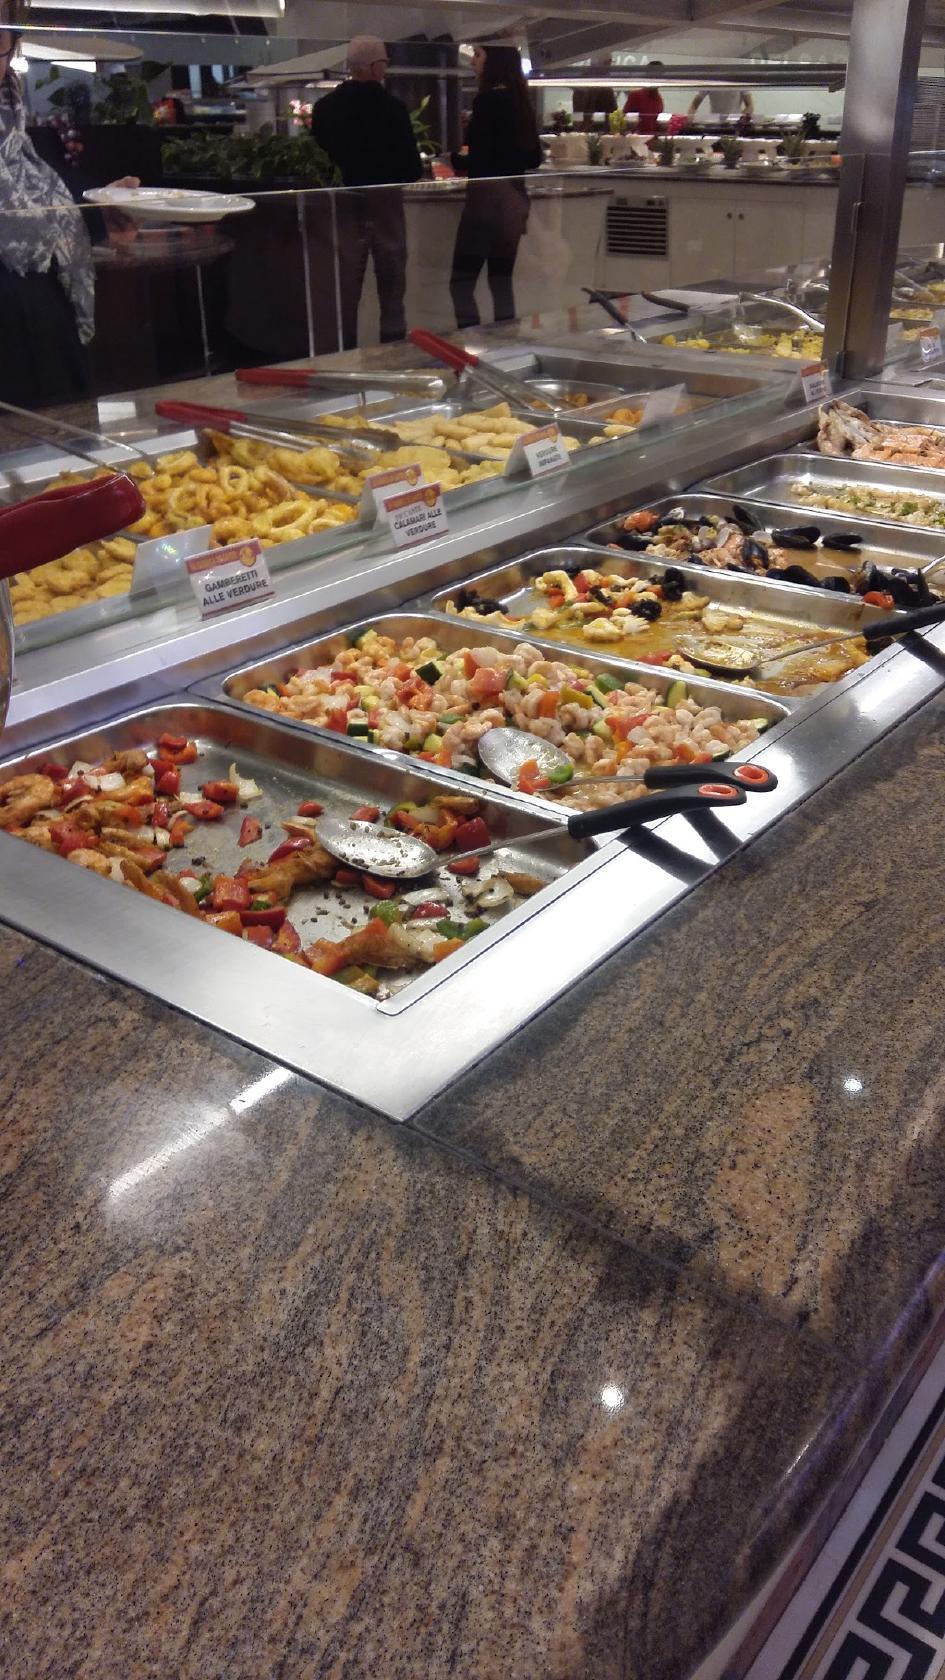 Mille Gusti Nova Milanese Prezzi ristorante wok 1000 gusti all you can eat, nova milanese